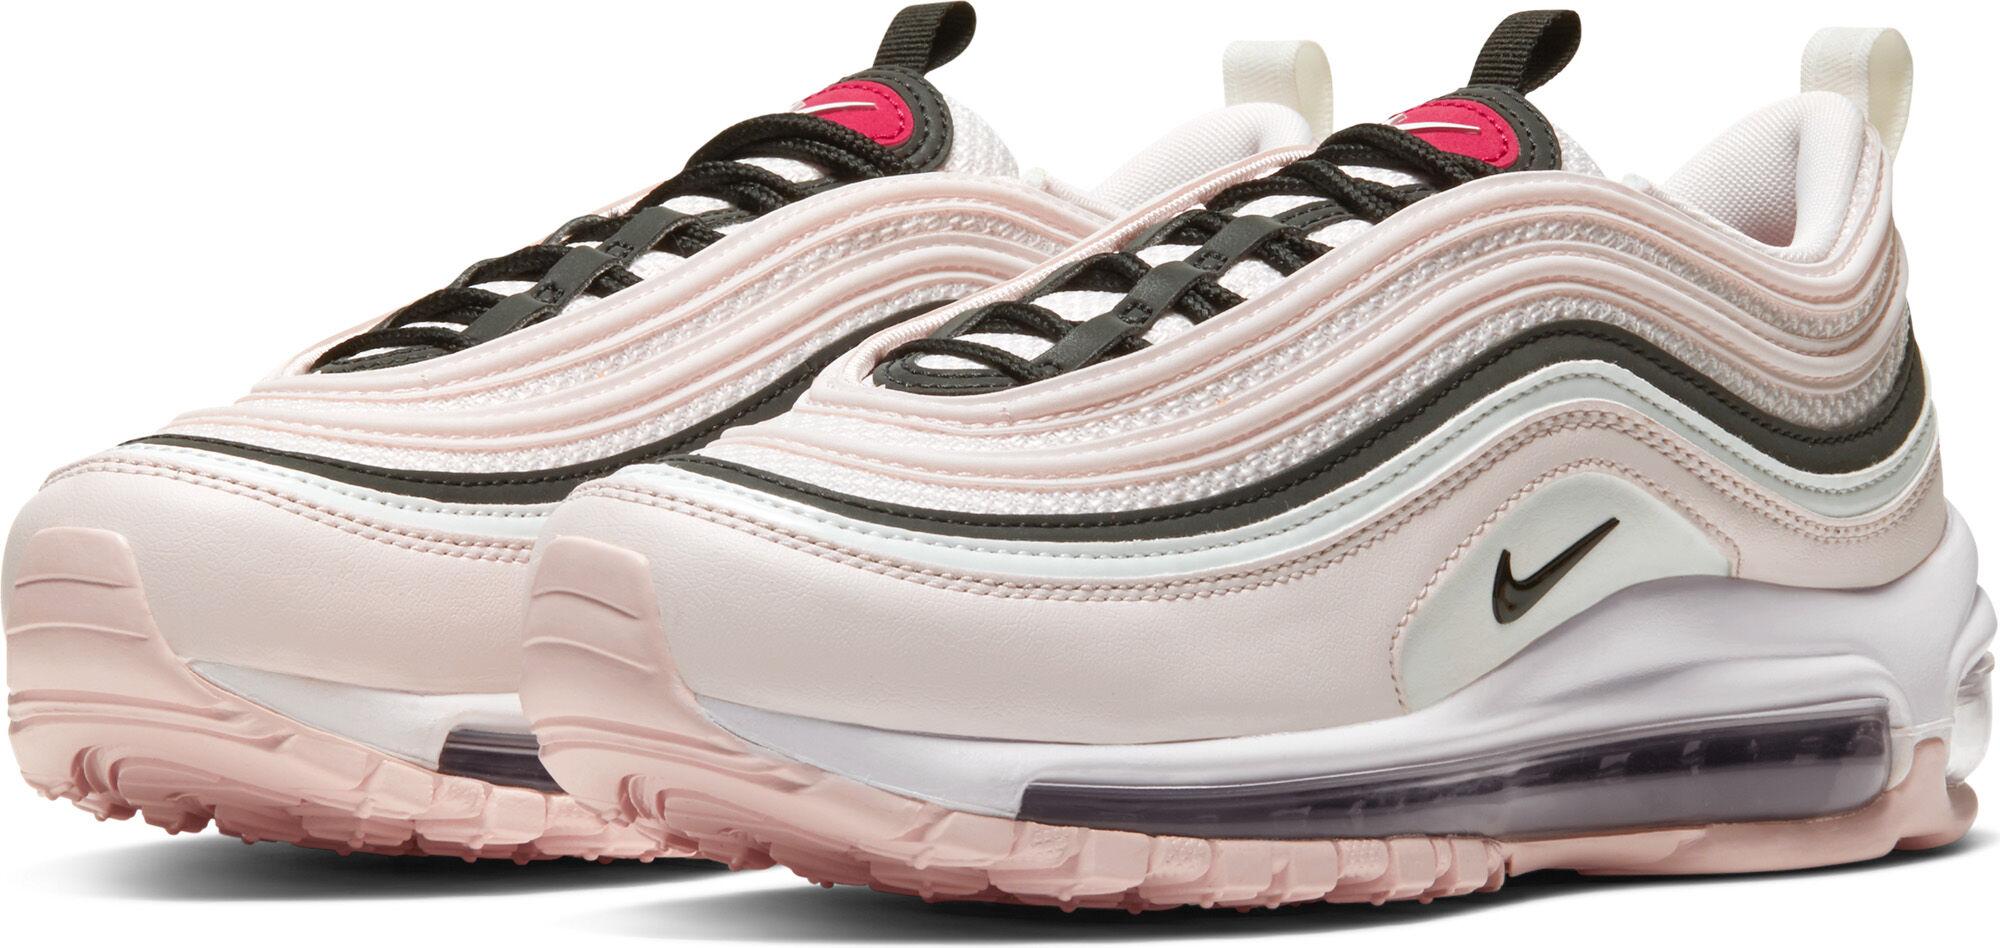 NIKE Air Max 97 Sneakers Dames 921733 603 rood online